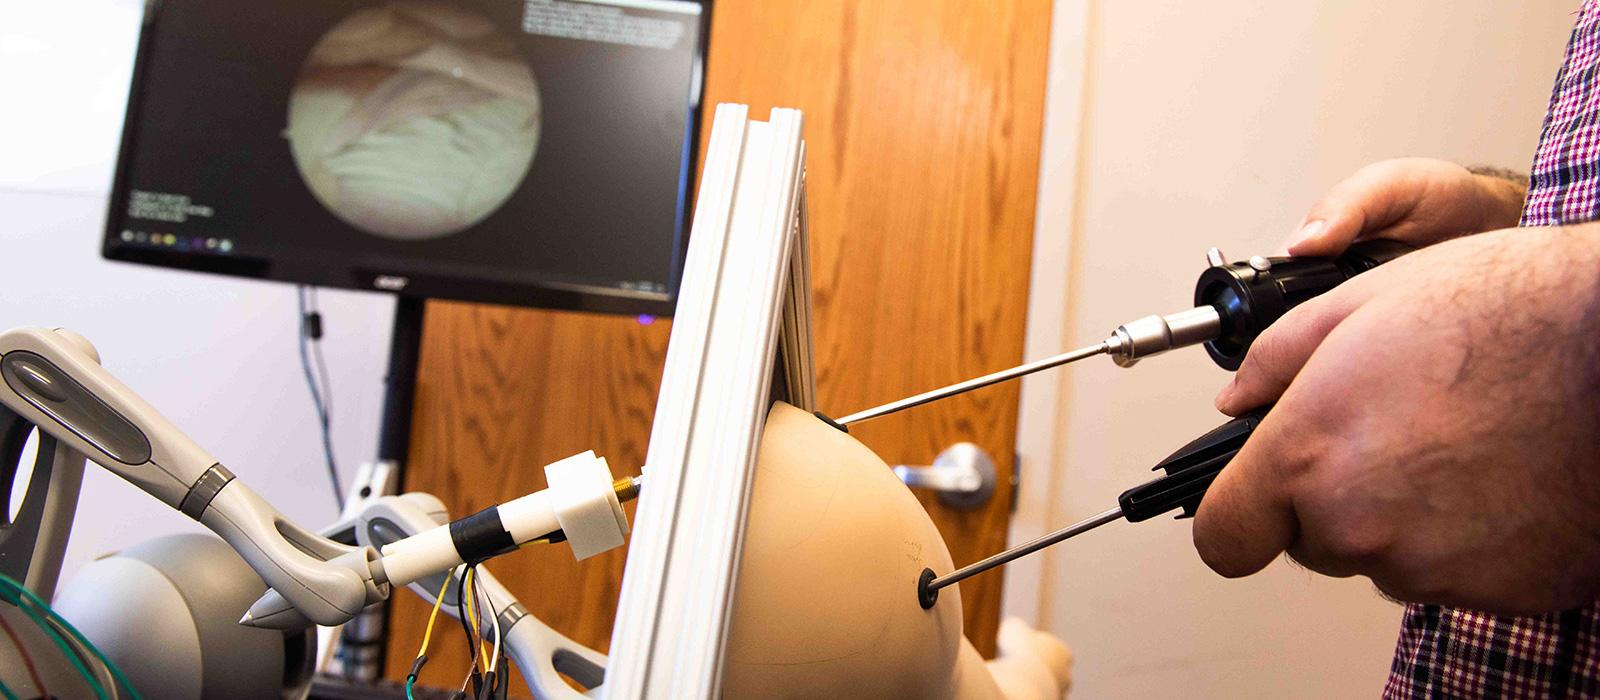 Virtual Tools Designed to Aid Future Surgeons